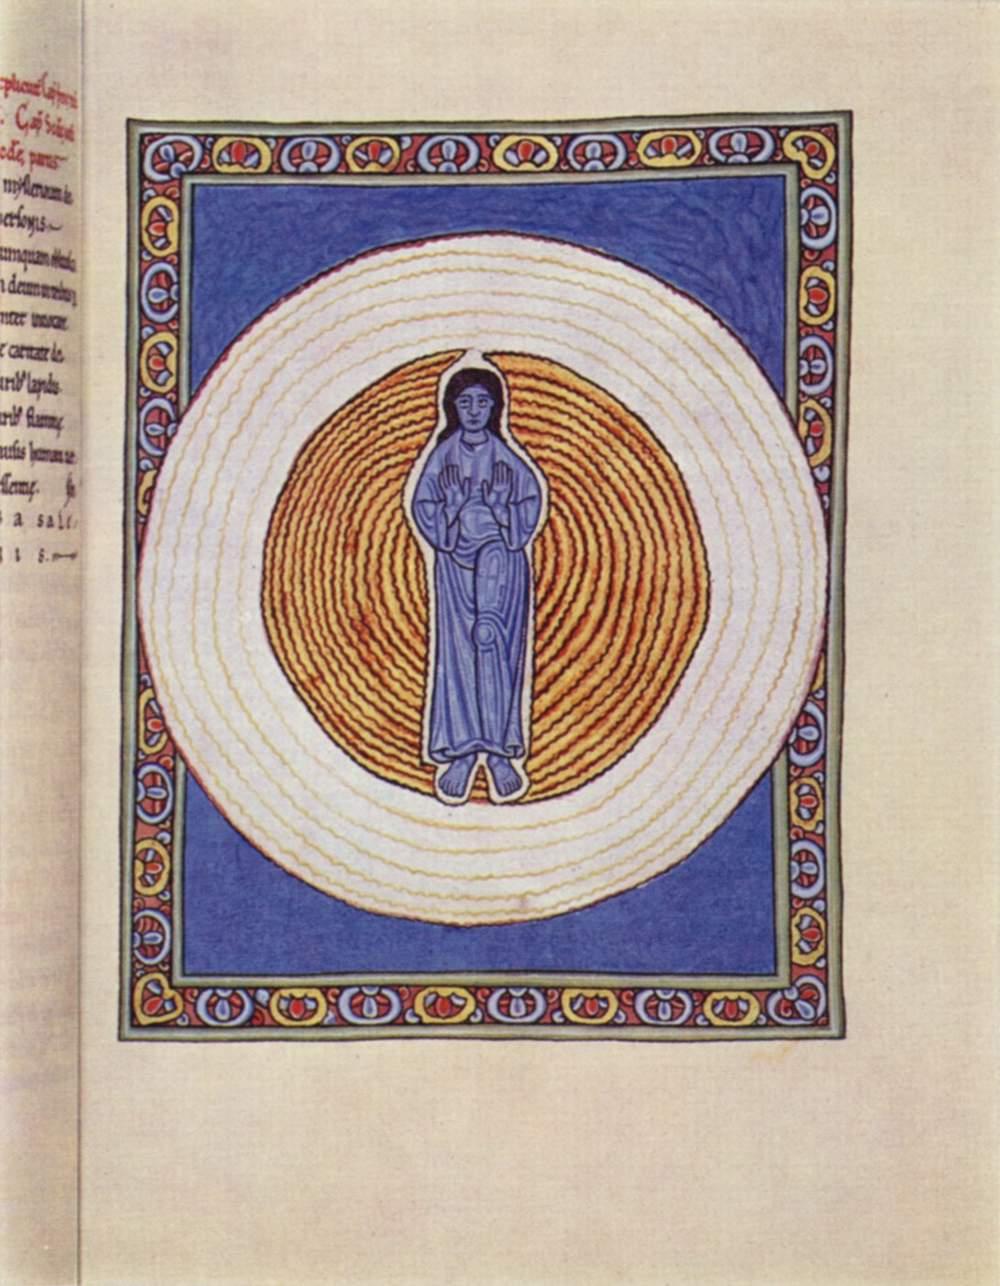 https://i1.wp.com/upload.wikimedia.org/wikipedia/commons/f/f6/Meister_des_Hildegardis-Codex_003.jpg